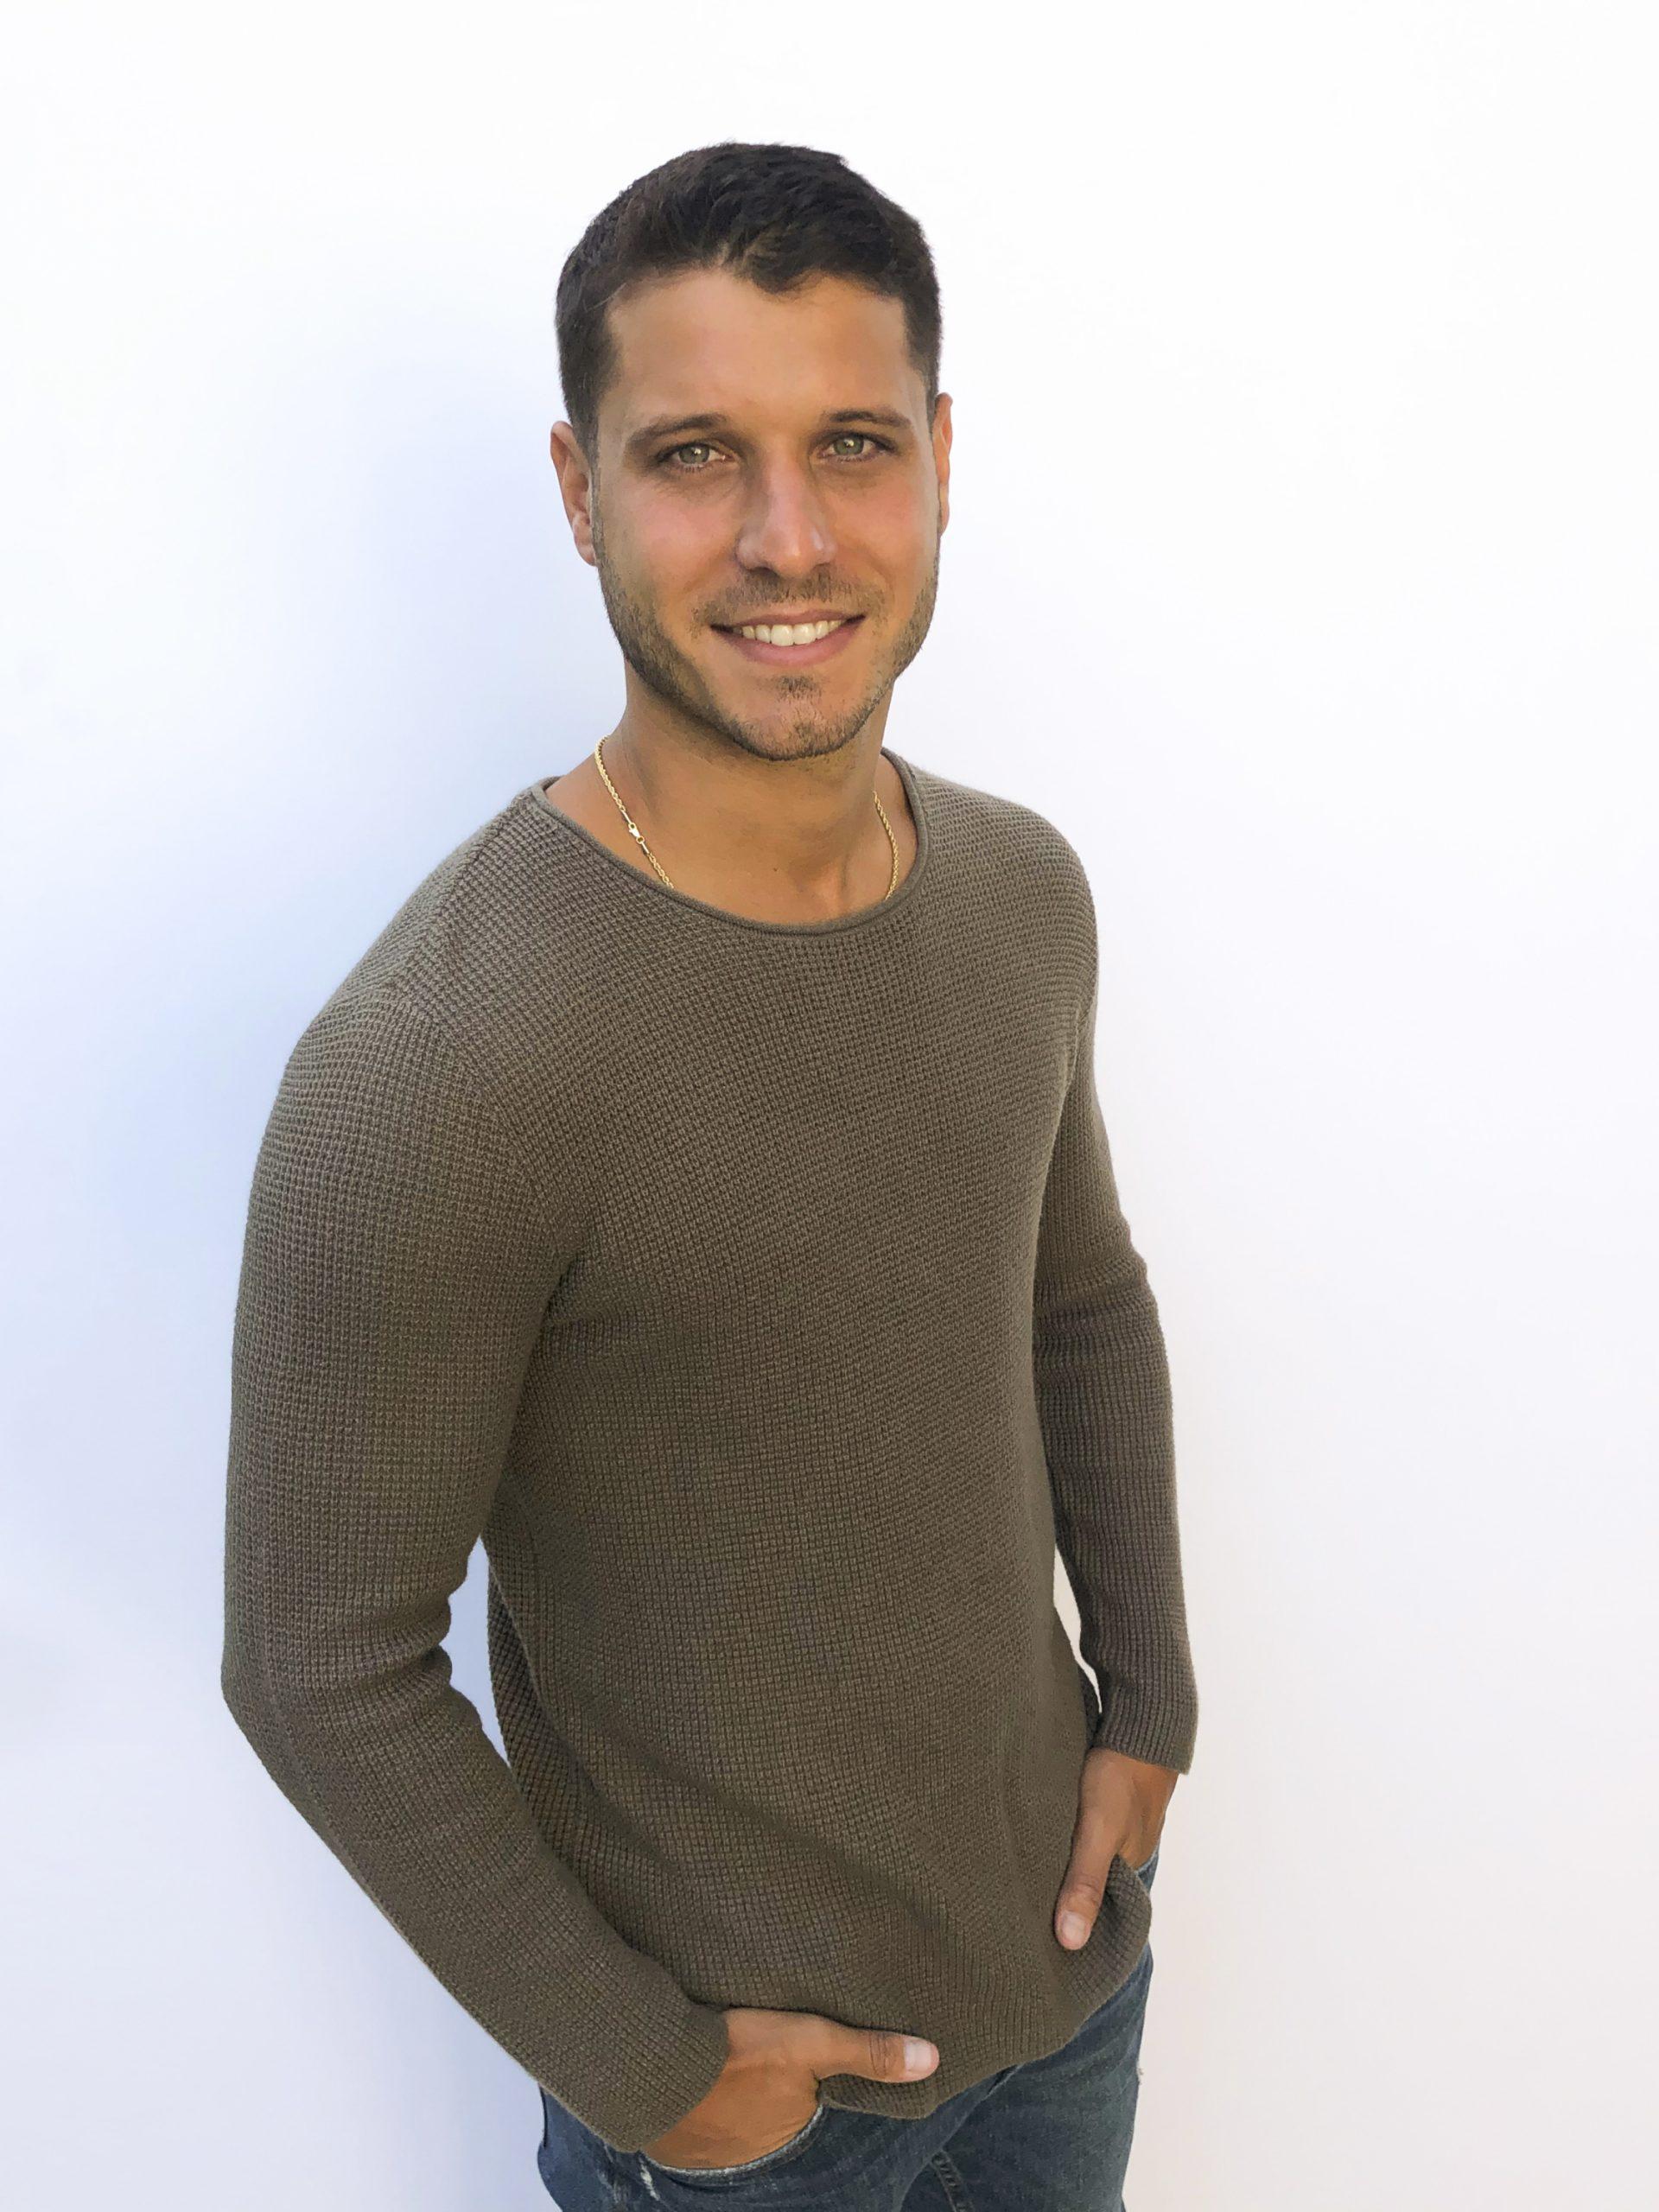 Cody Calafiore from Big Brother Season 16